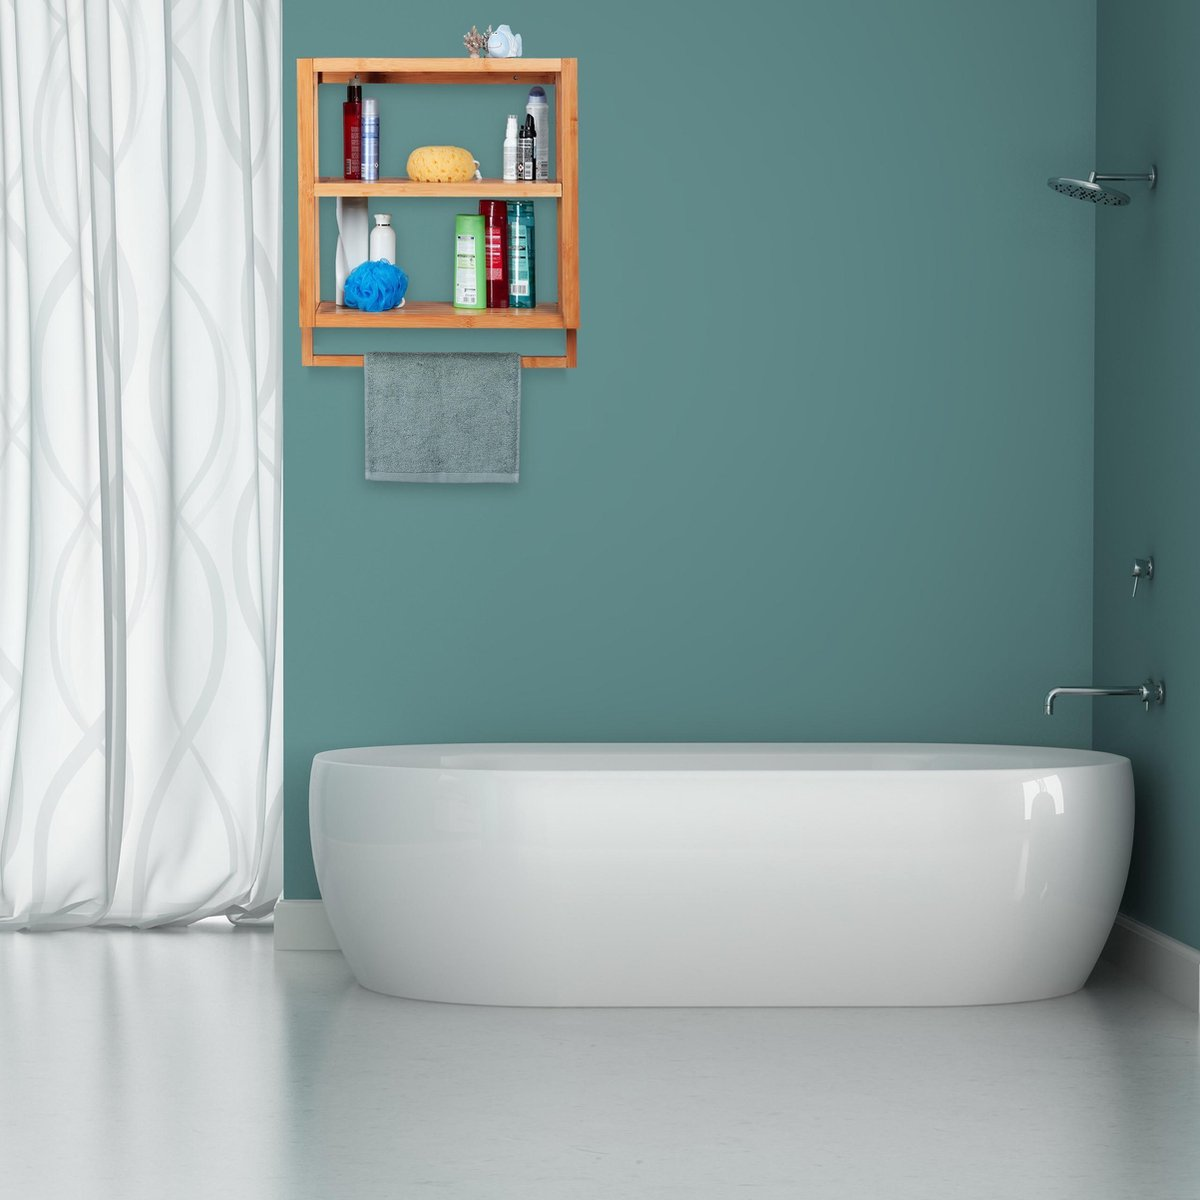 relaxdays wandrek - bamboe - 3 etages - badkamerrek - handdoekhouder - keukenrek